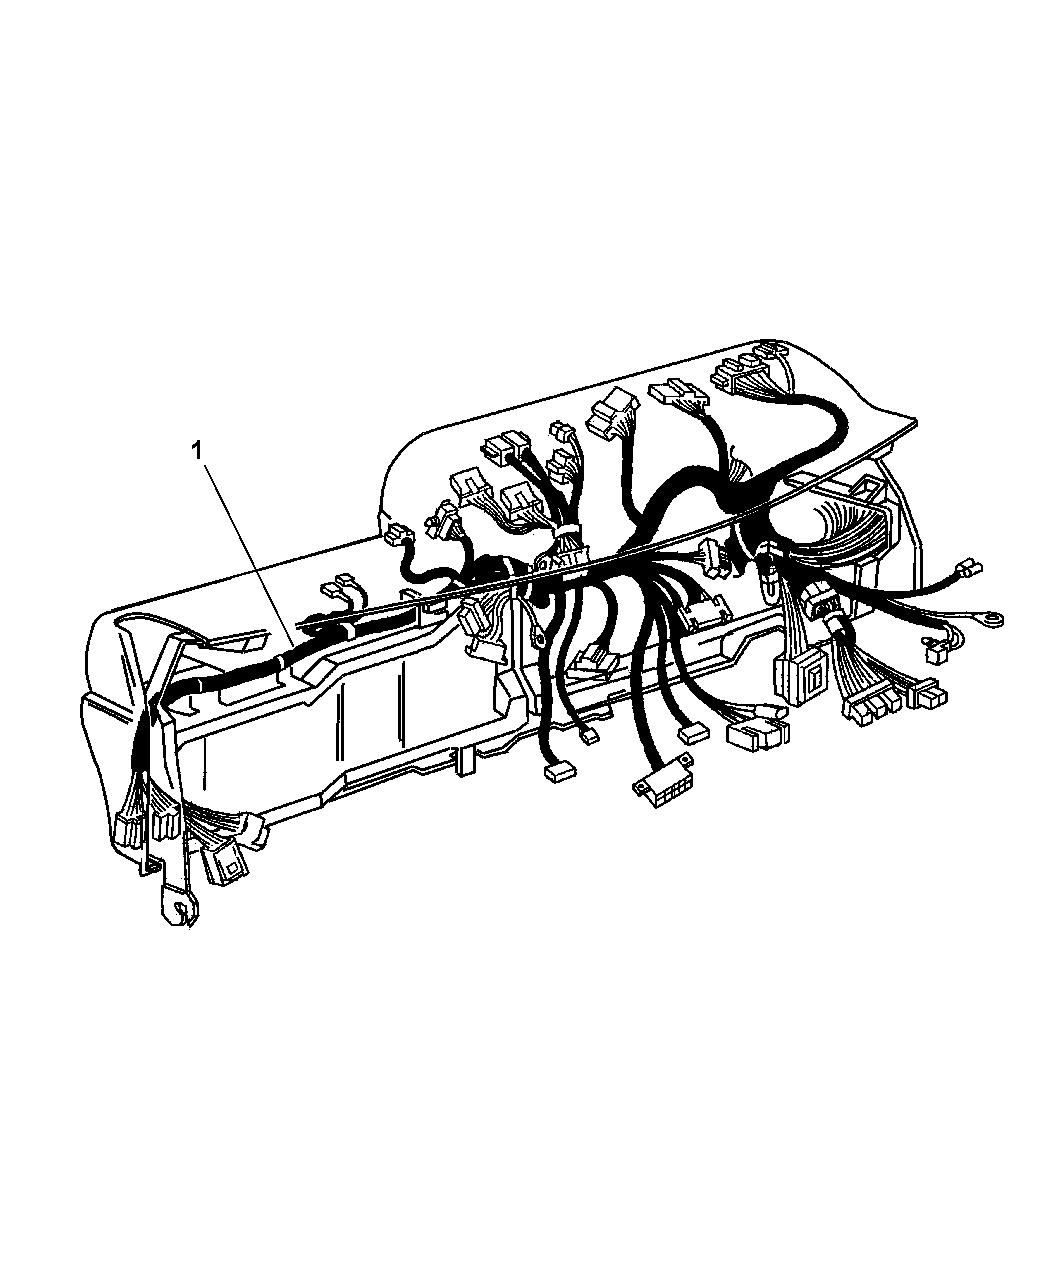 1998 Dodge Ram 1500 Regular Cab Wiring